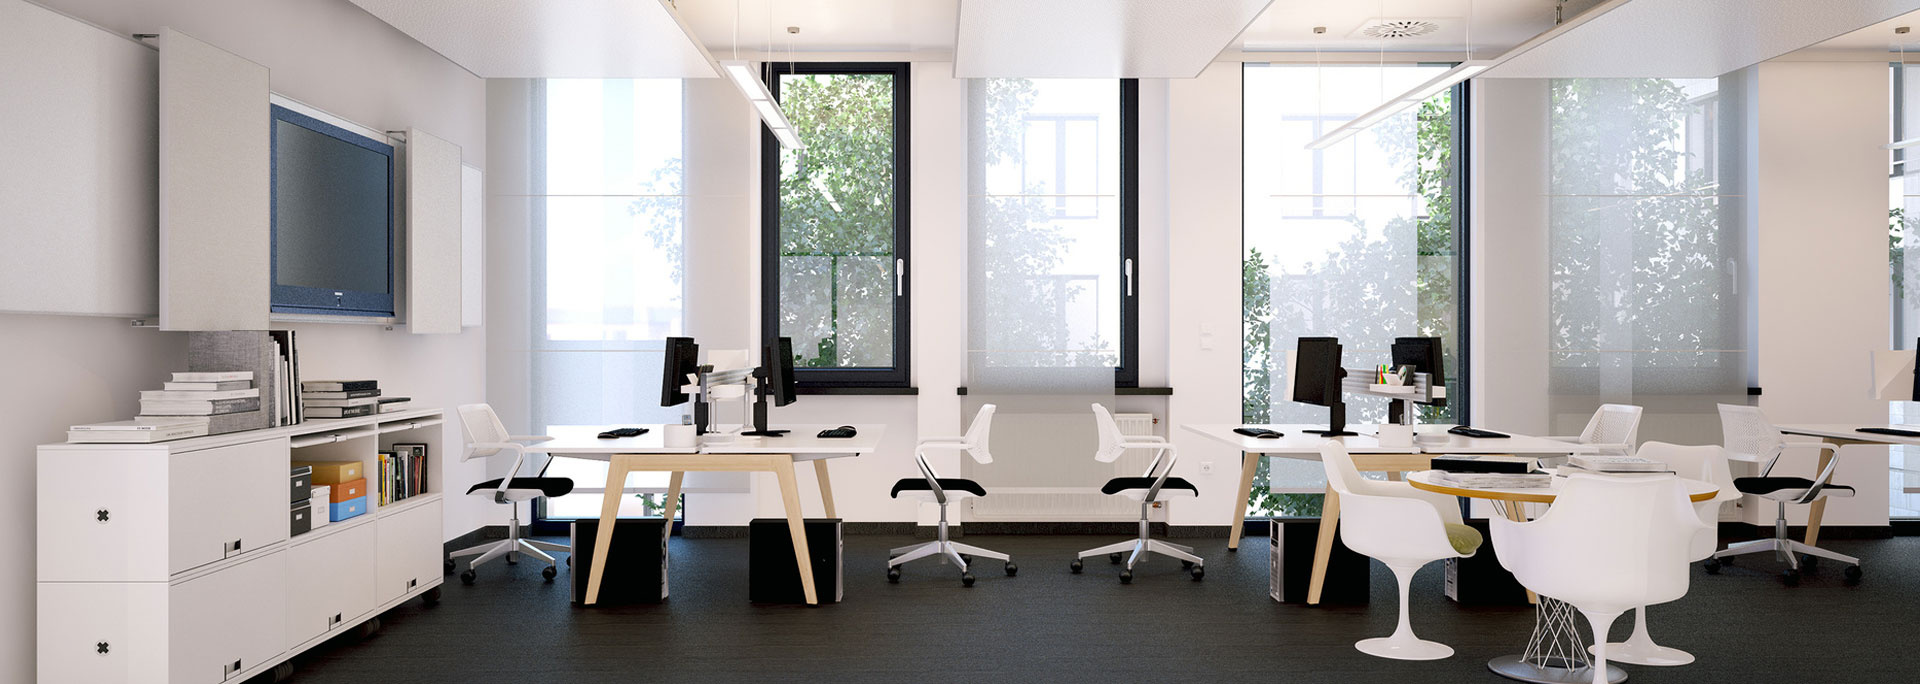 mb immobilier vente et location professionnelle antibes cagnes et st laurent. Black Bedroom Furniture Sets. Home Design Ideas